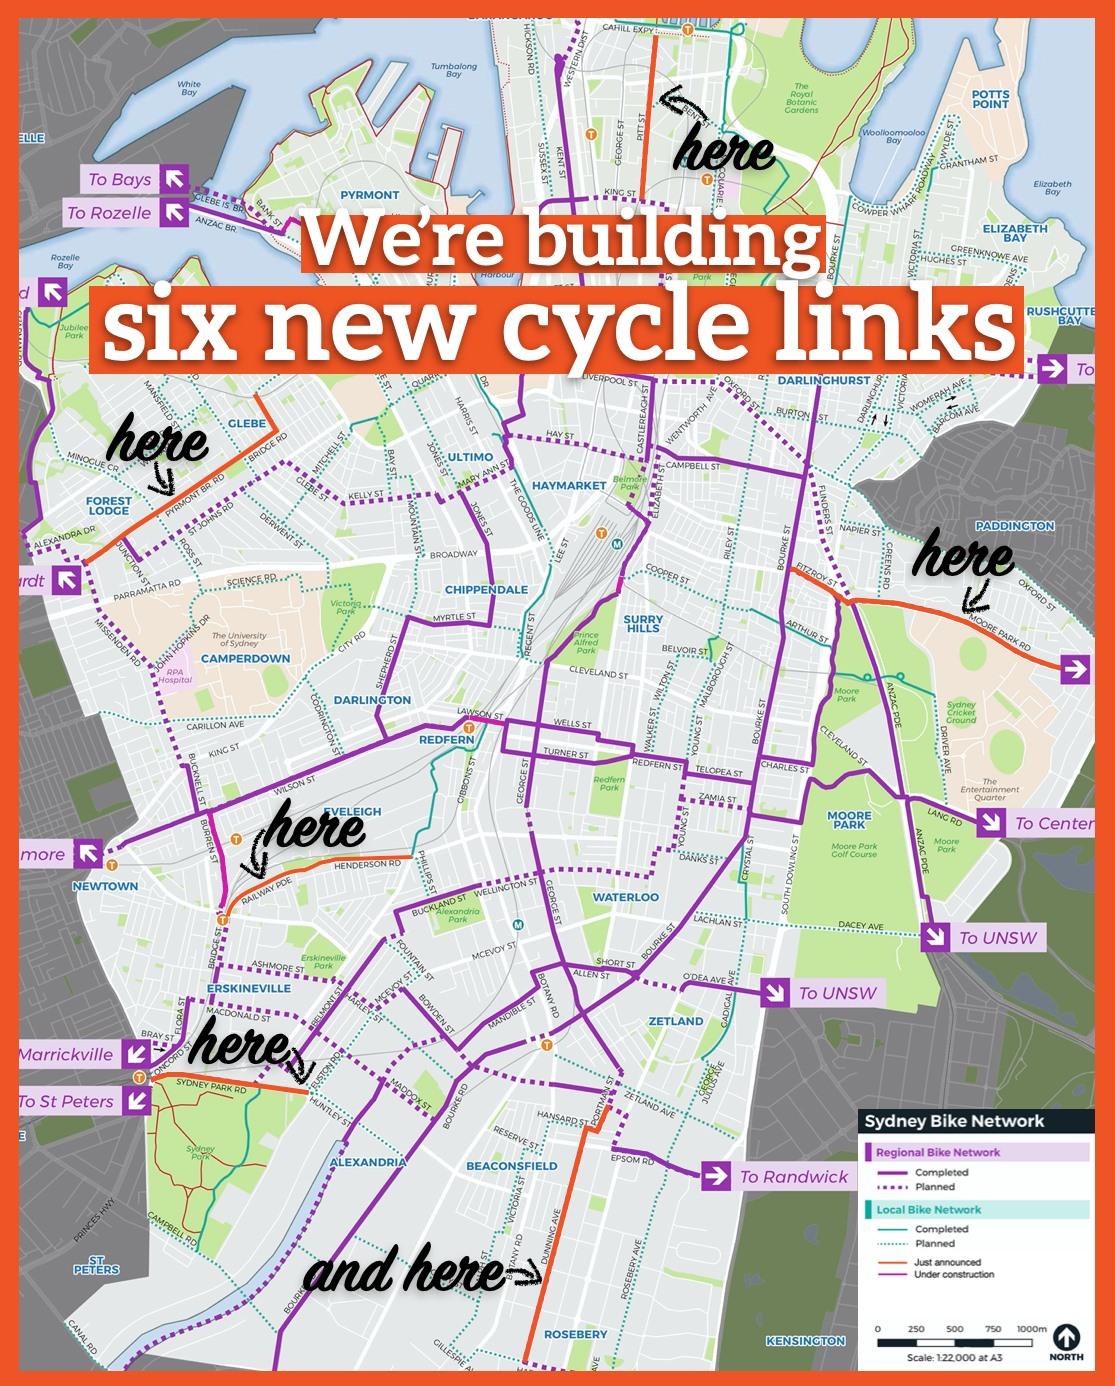 Sydney's six new cycle links